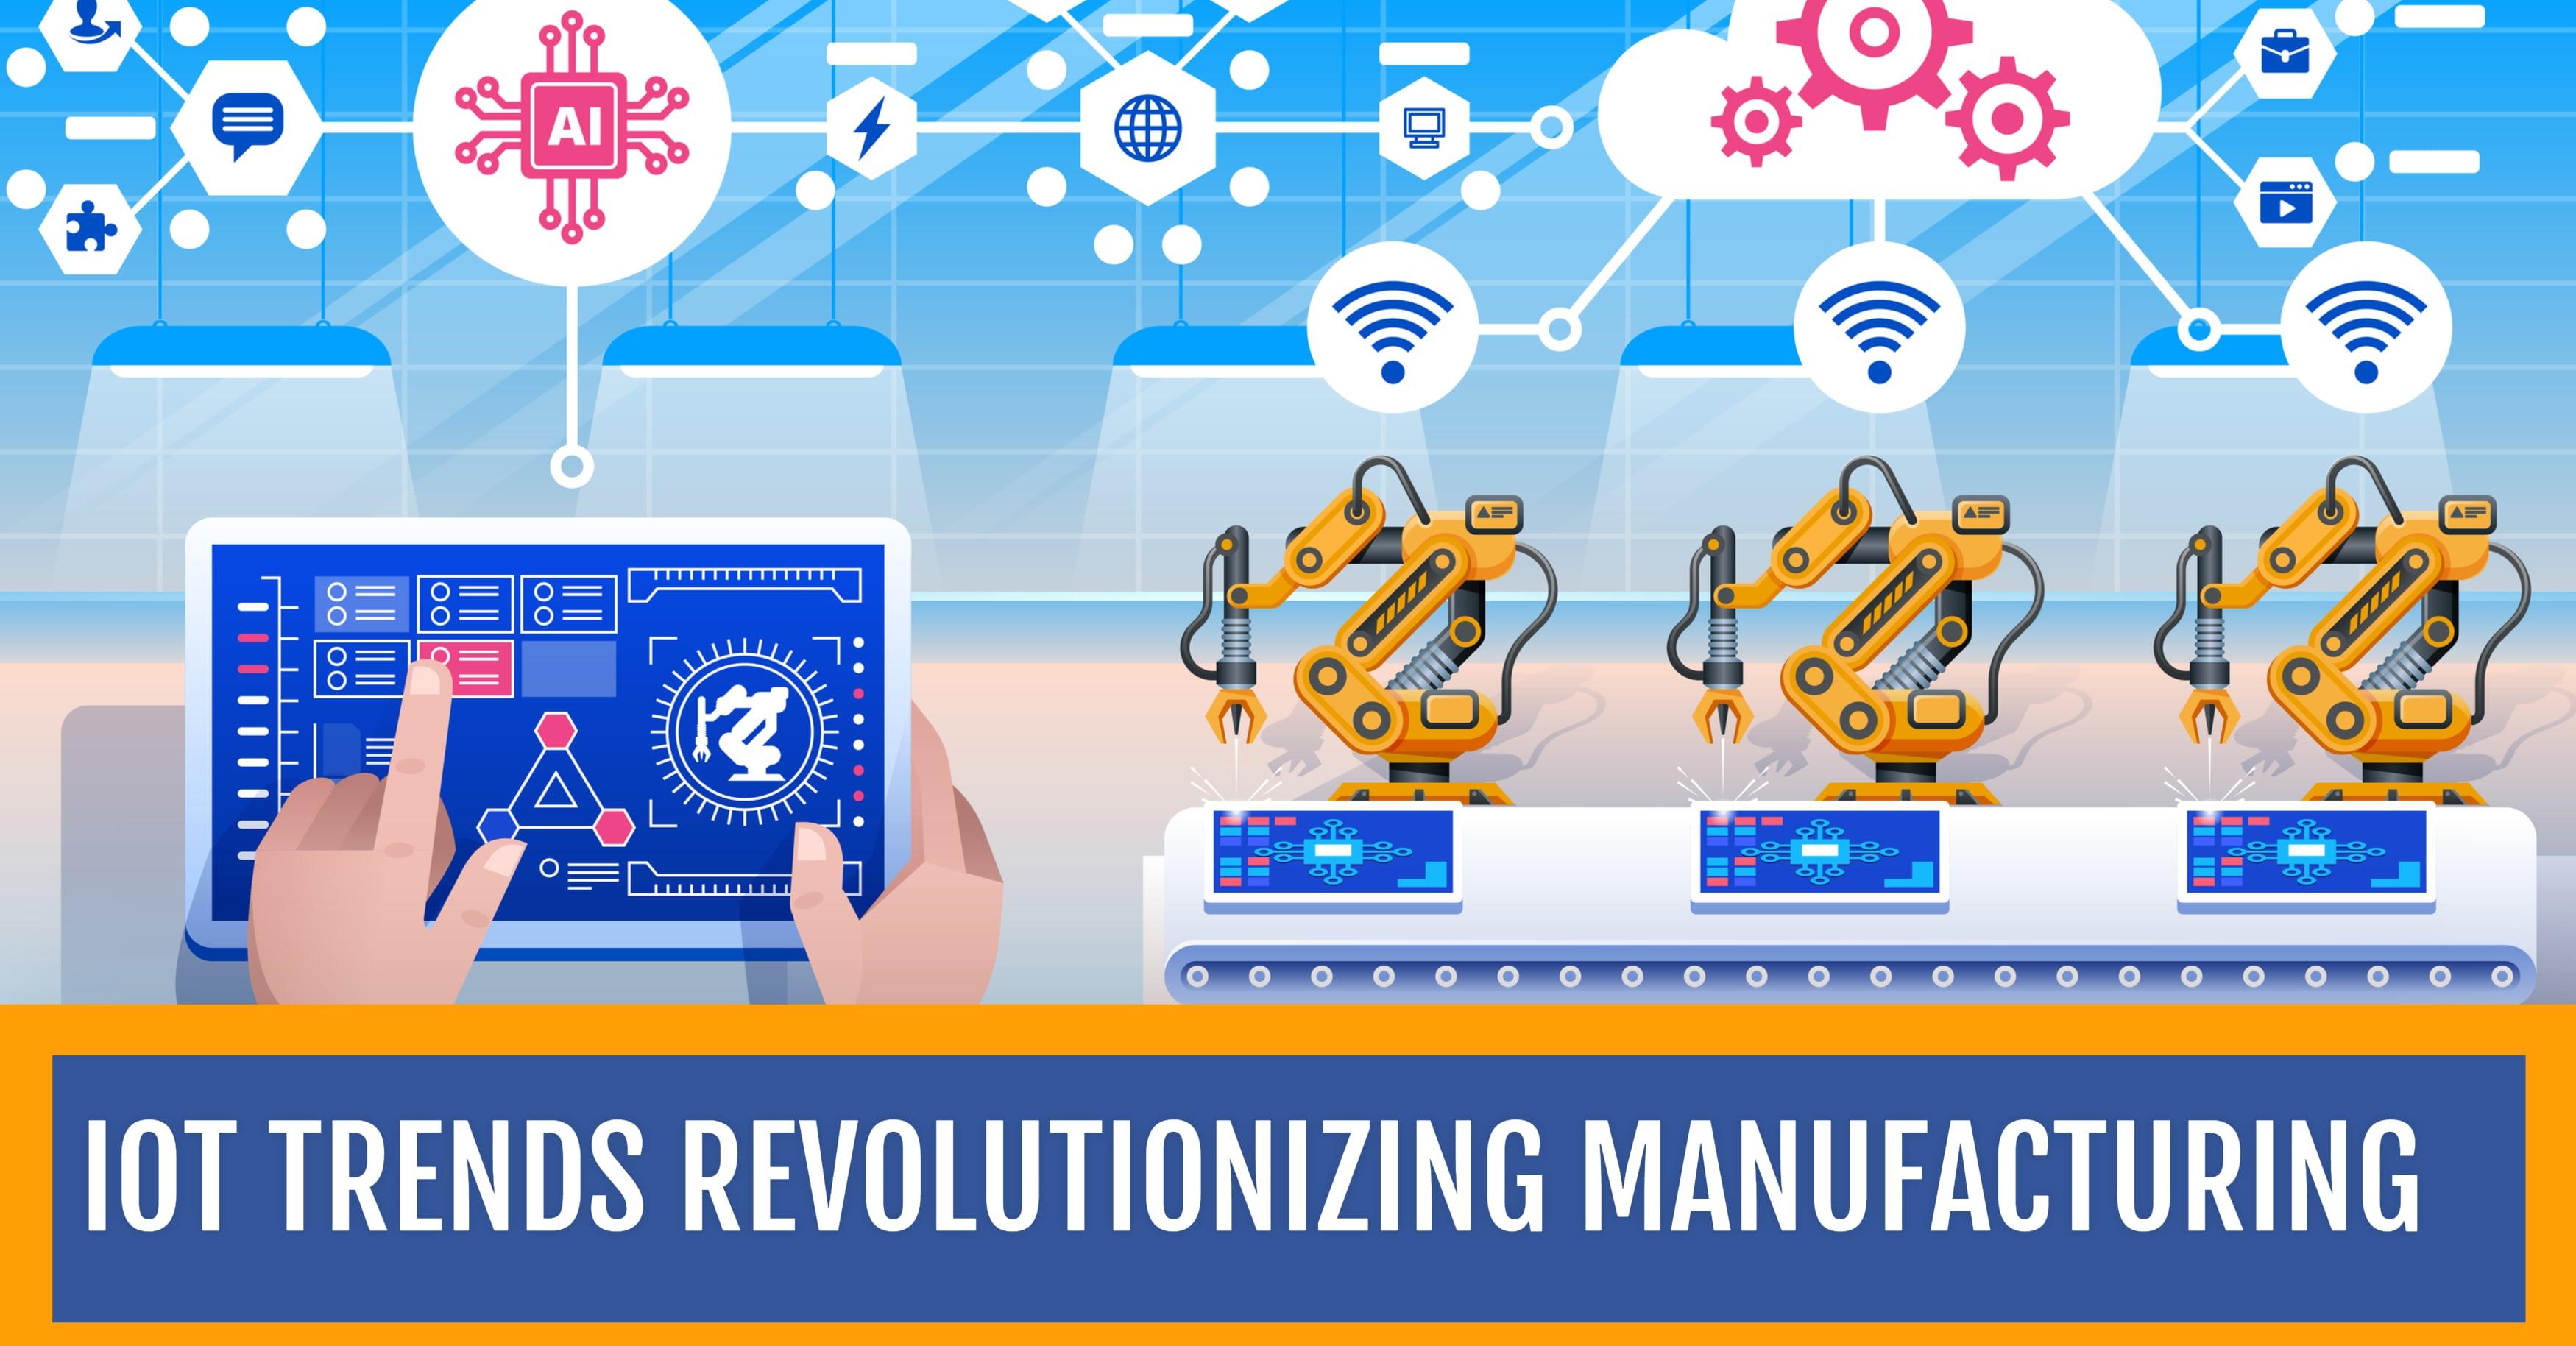 Iot Trends Revolutionizing Manufacturing